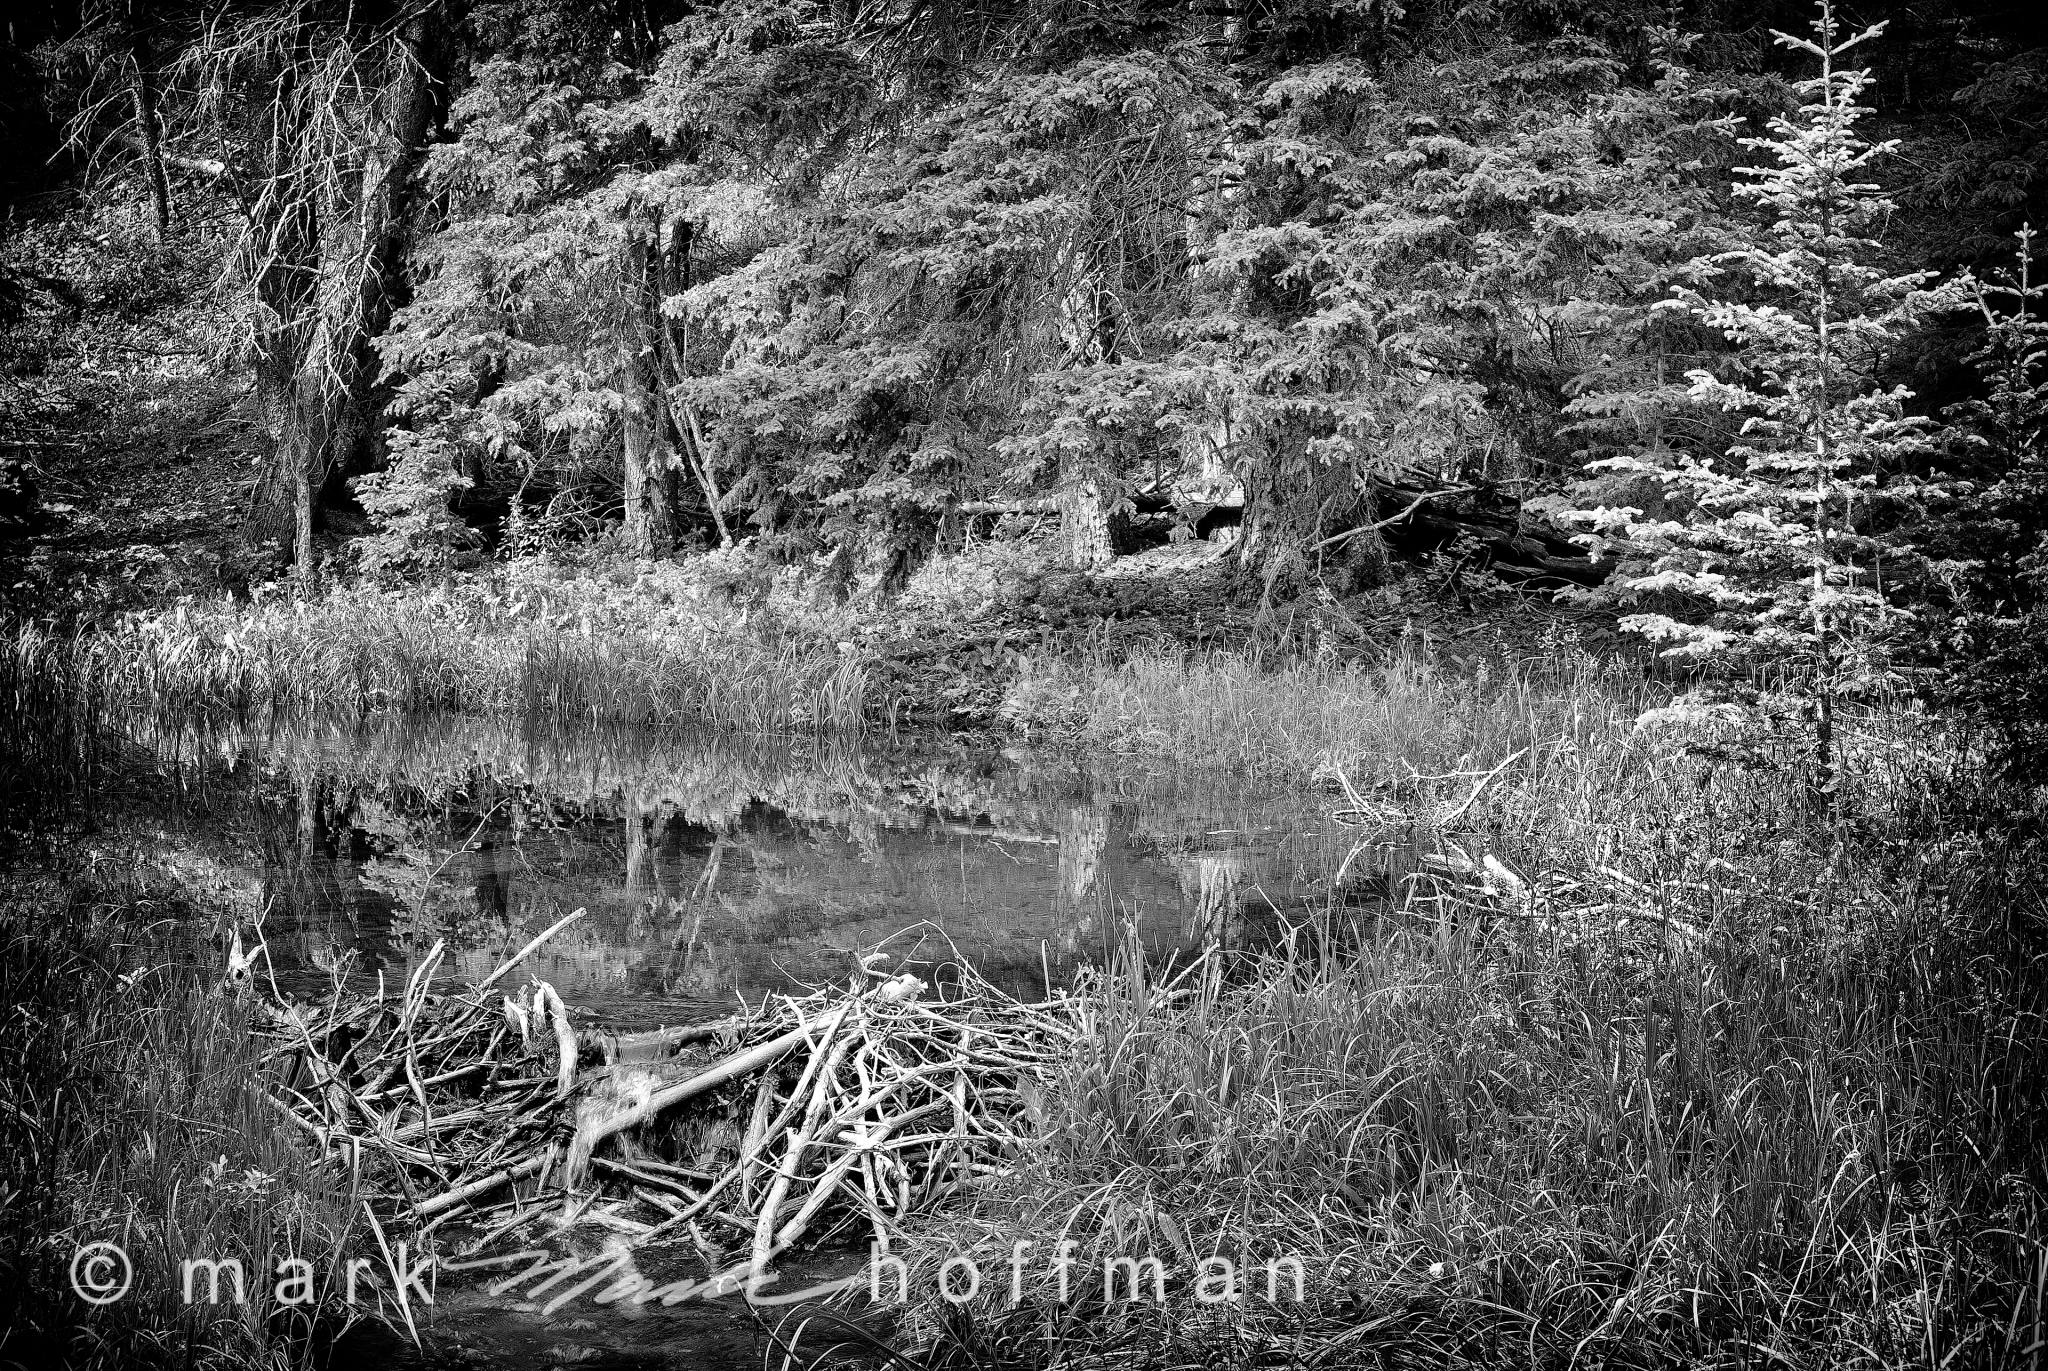 Mark_Hoffman_ND24906-Edit_cap1_var1.jpg